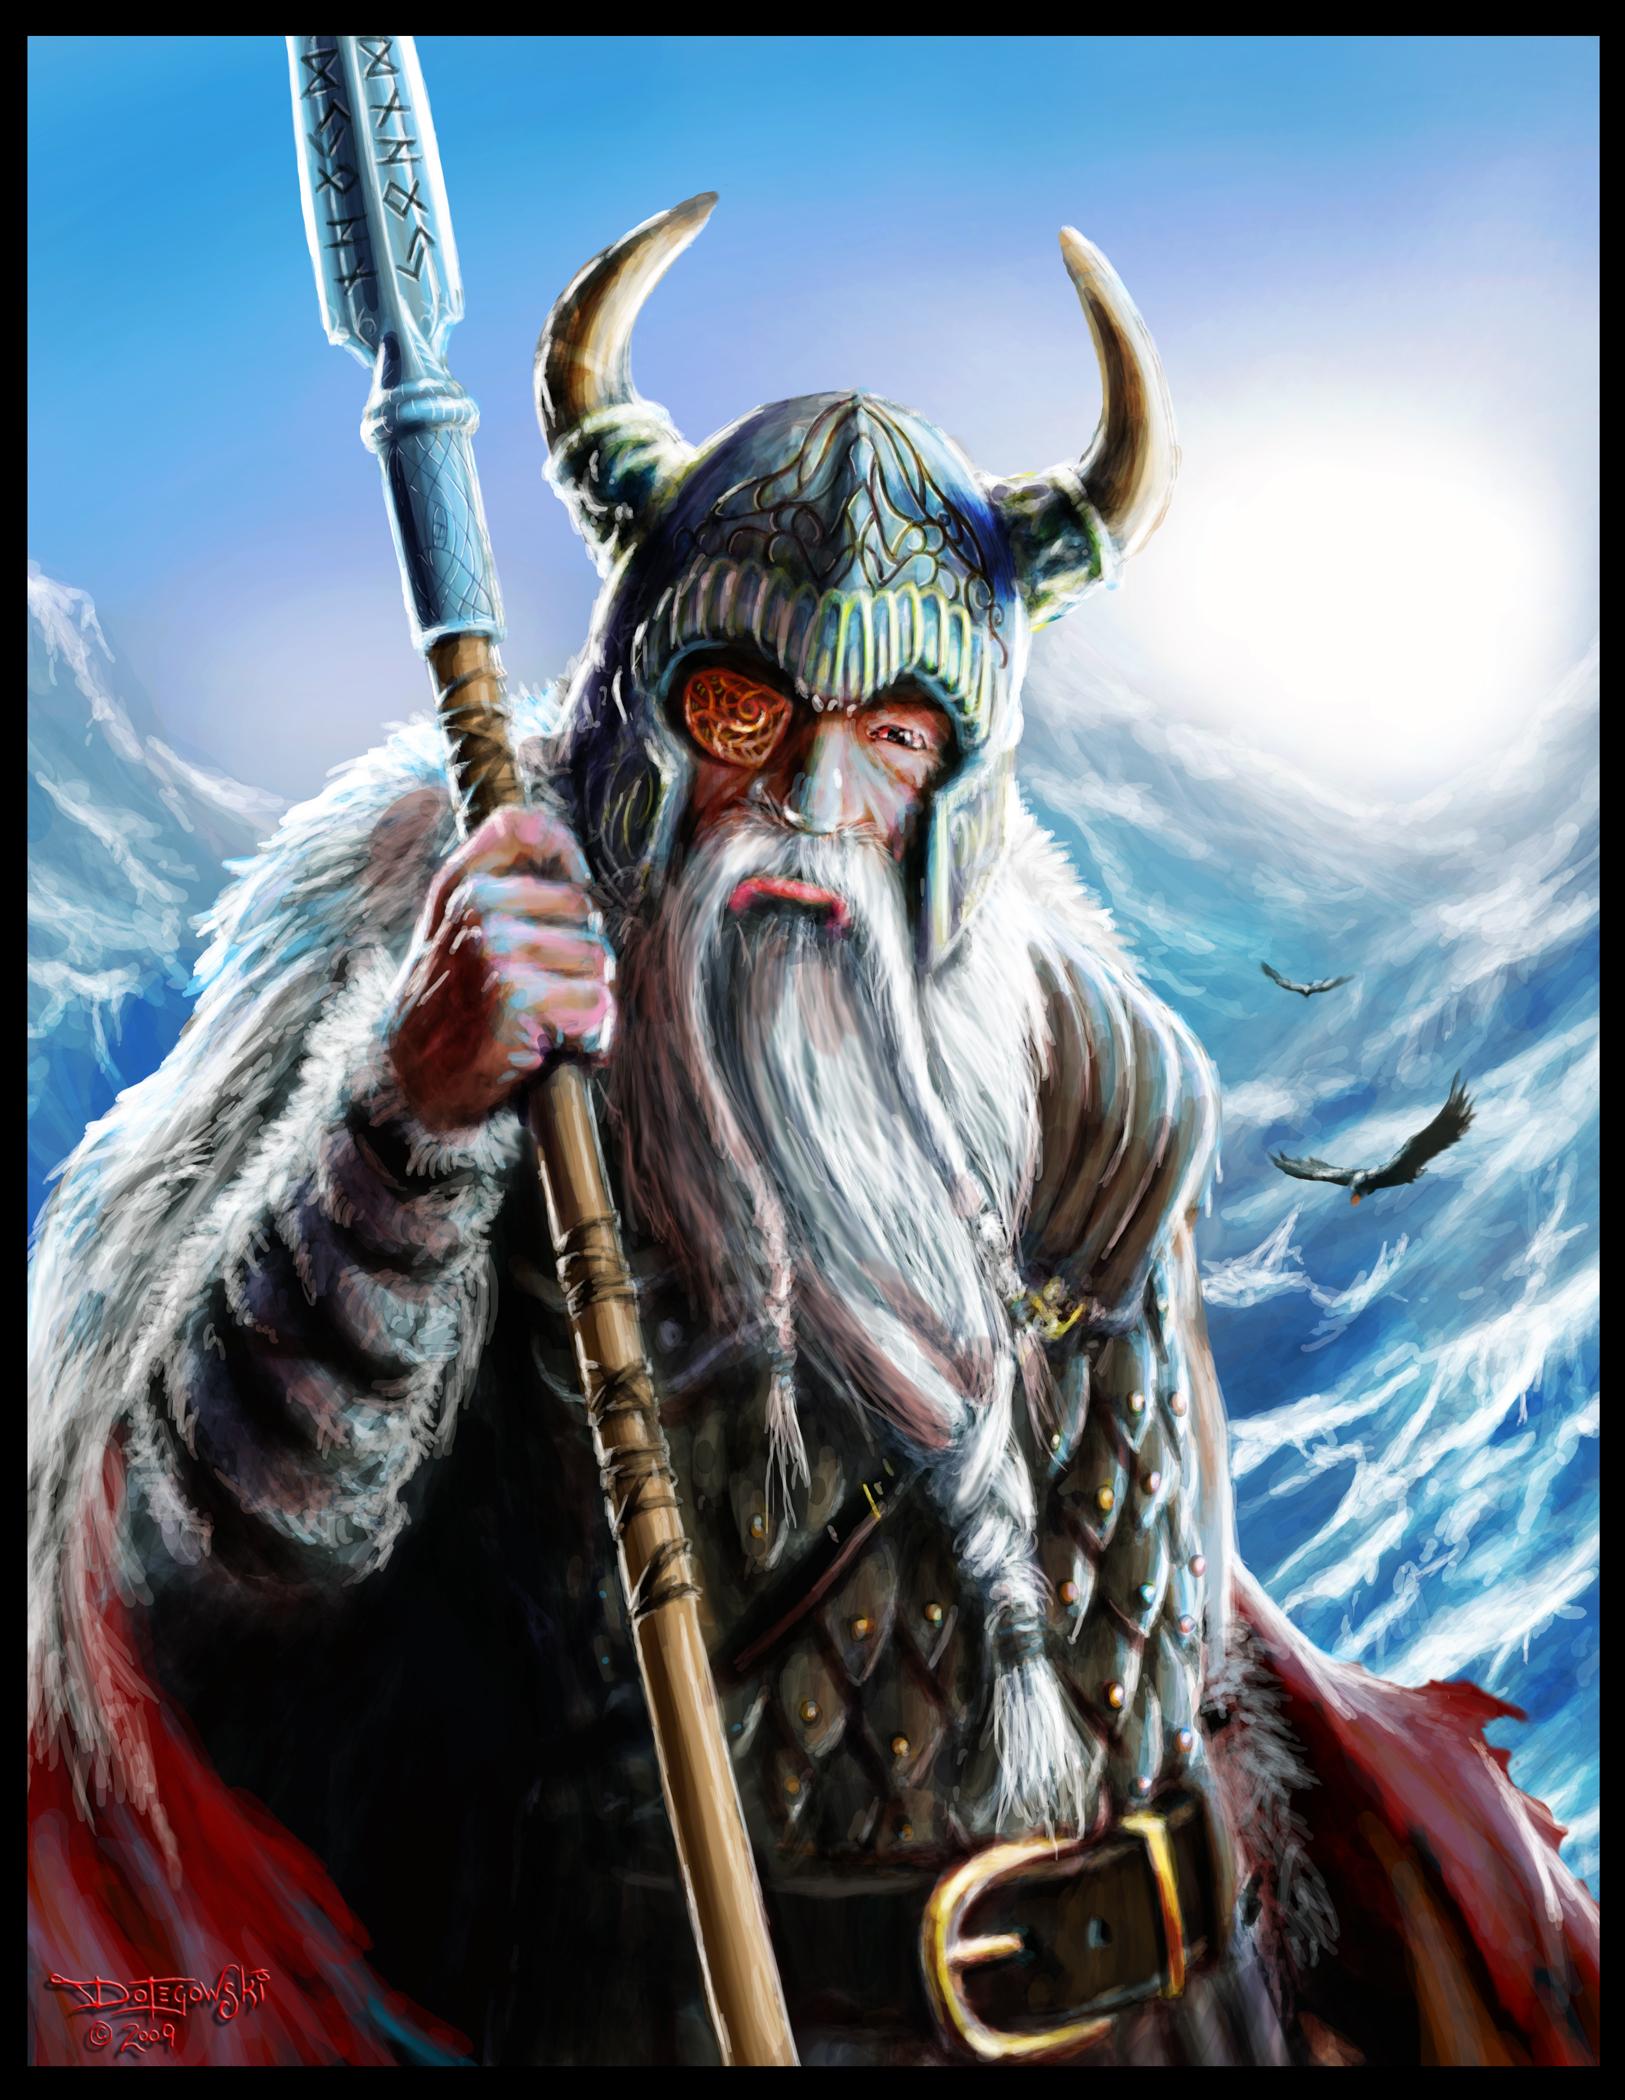 http://vignette3.wikia.nocookie.net/demigodshaven/images/8/85/Odin.jpg/revision/latest?cb=20110108023330